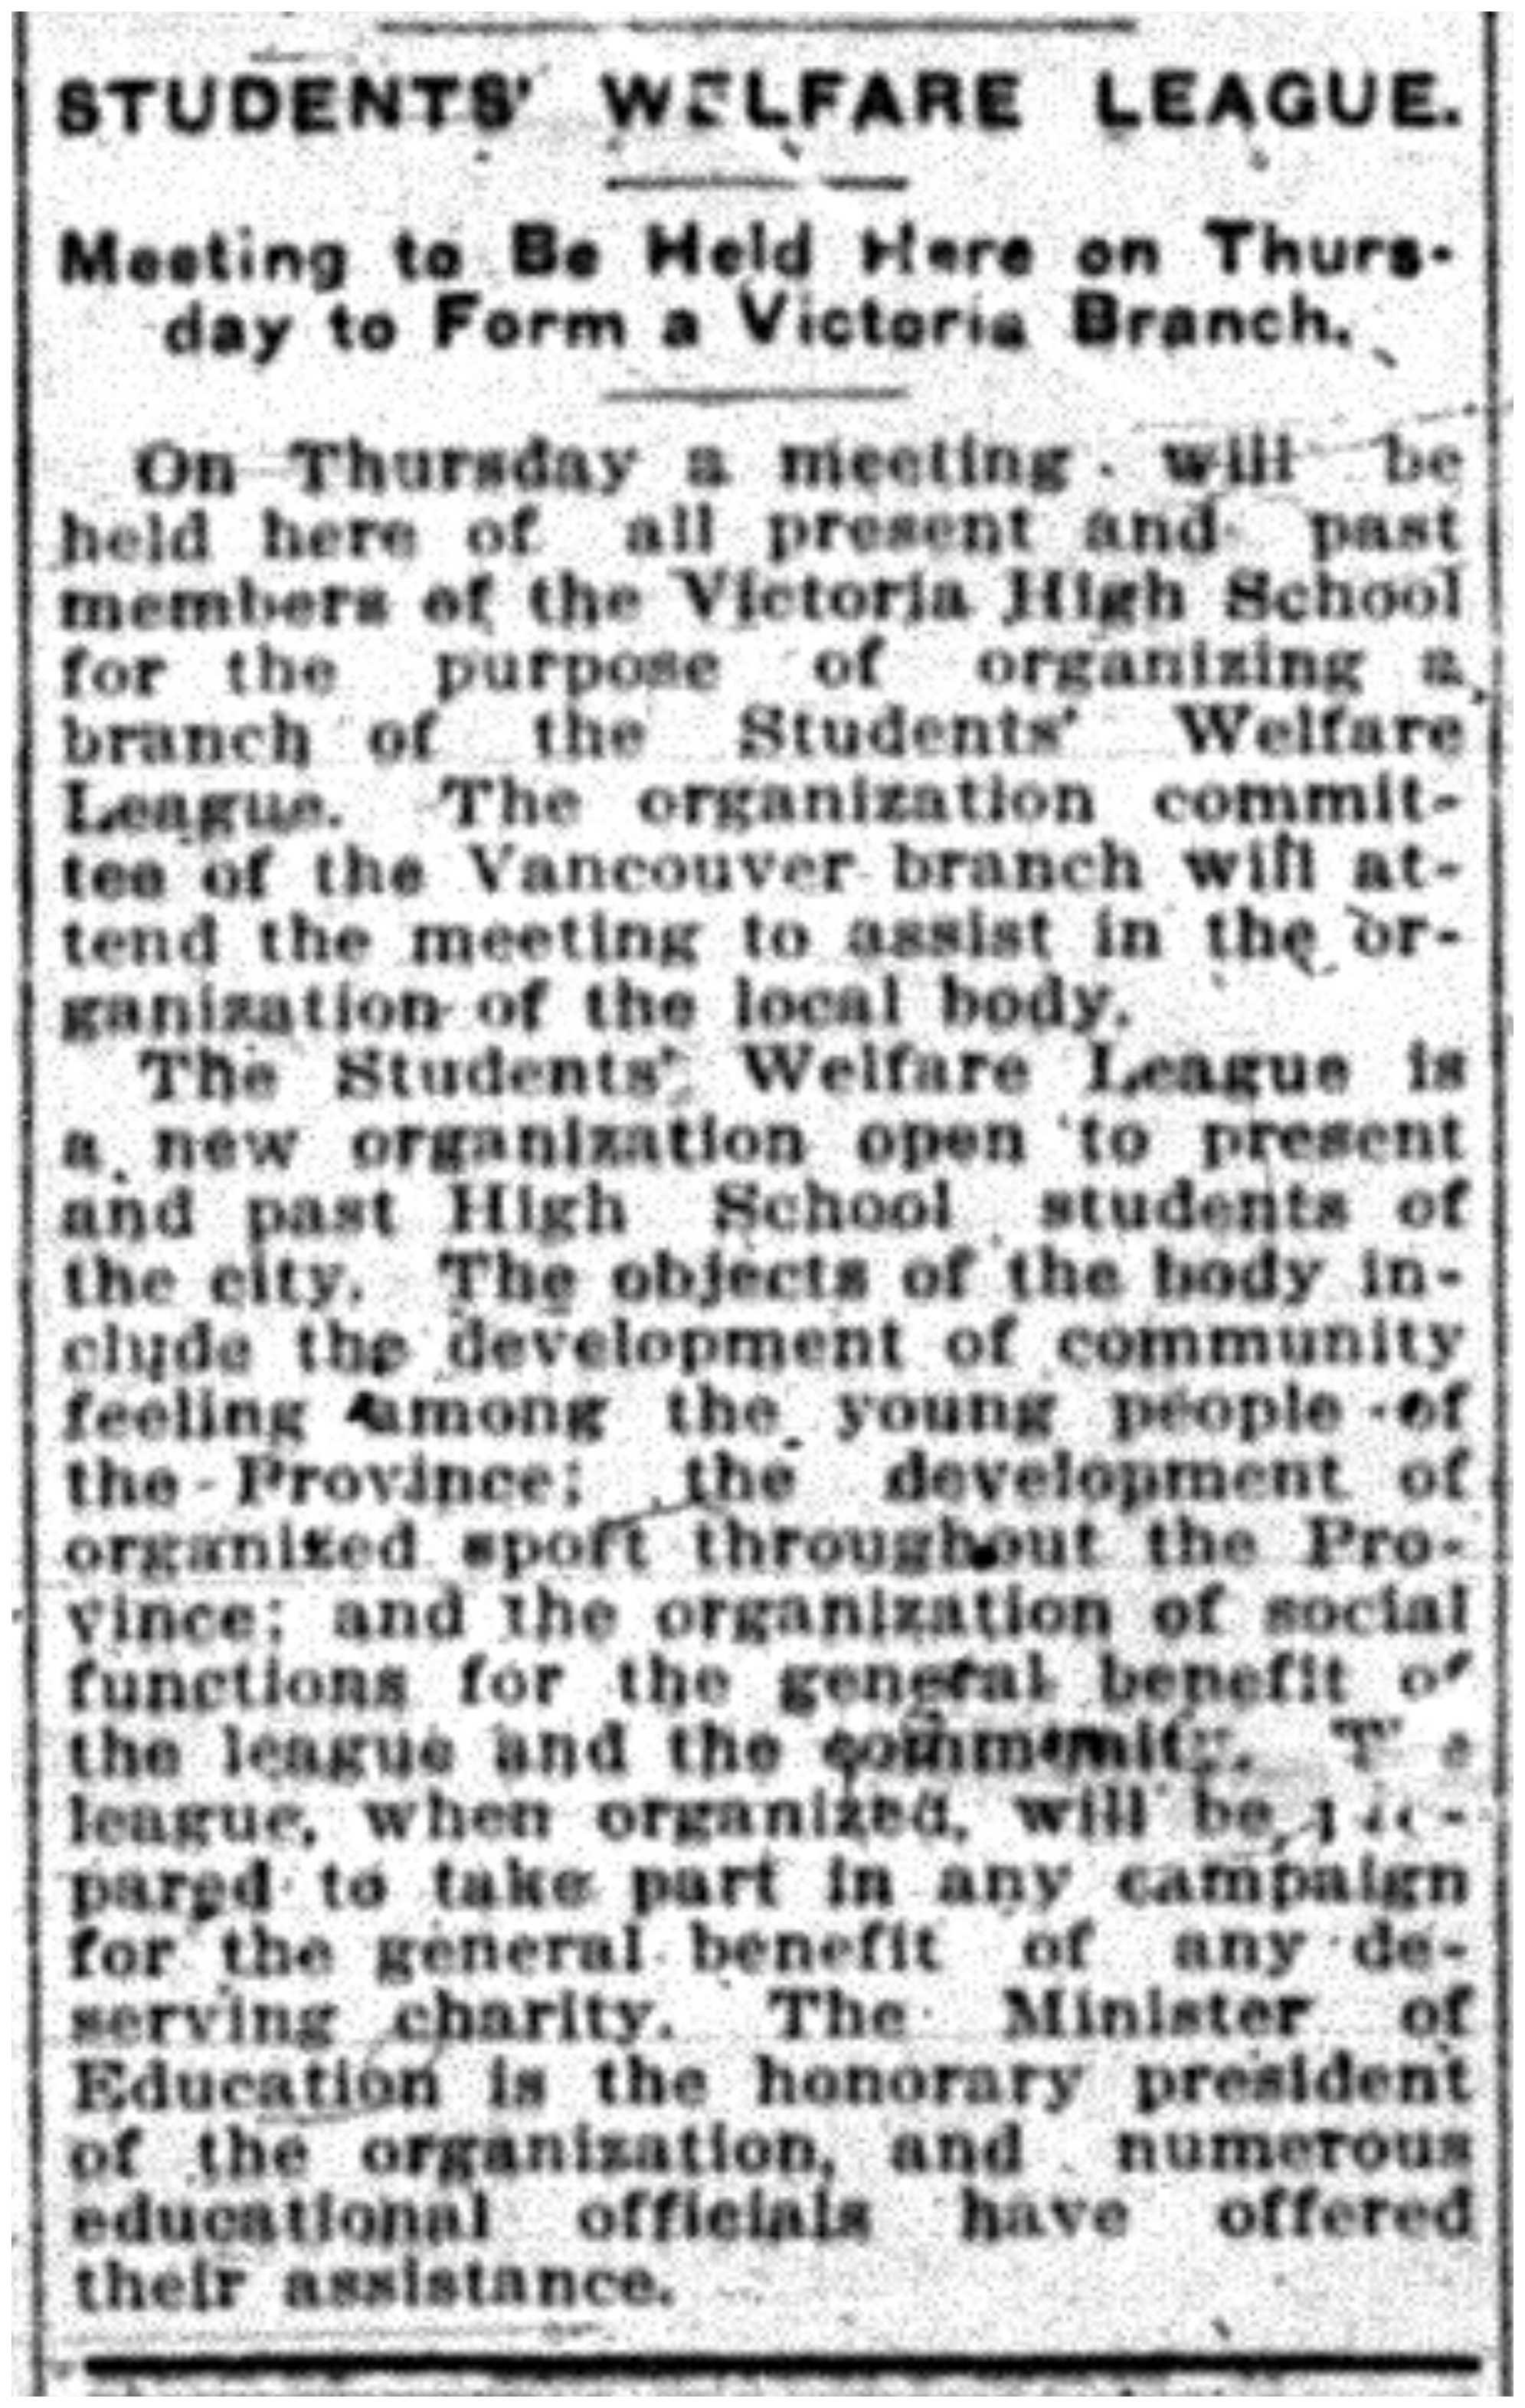 """Students Welfare League"""